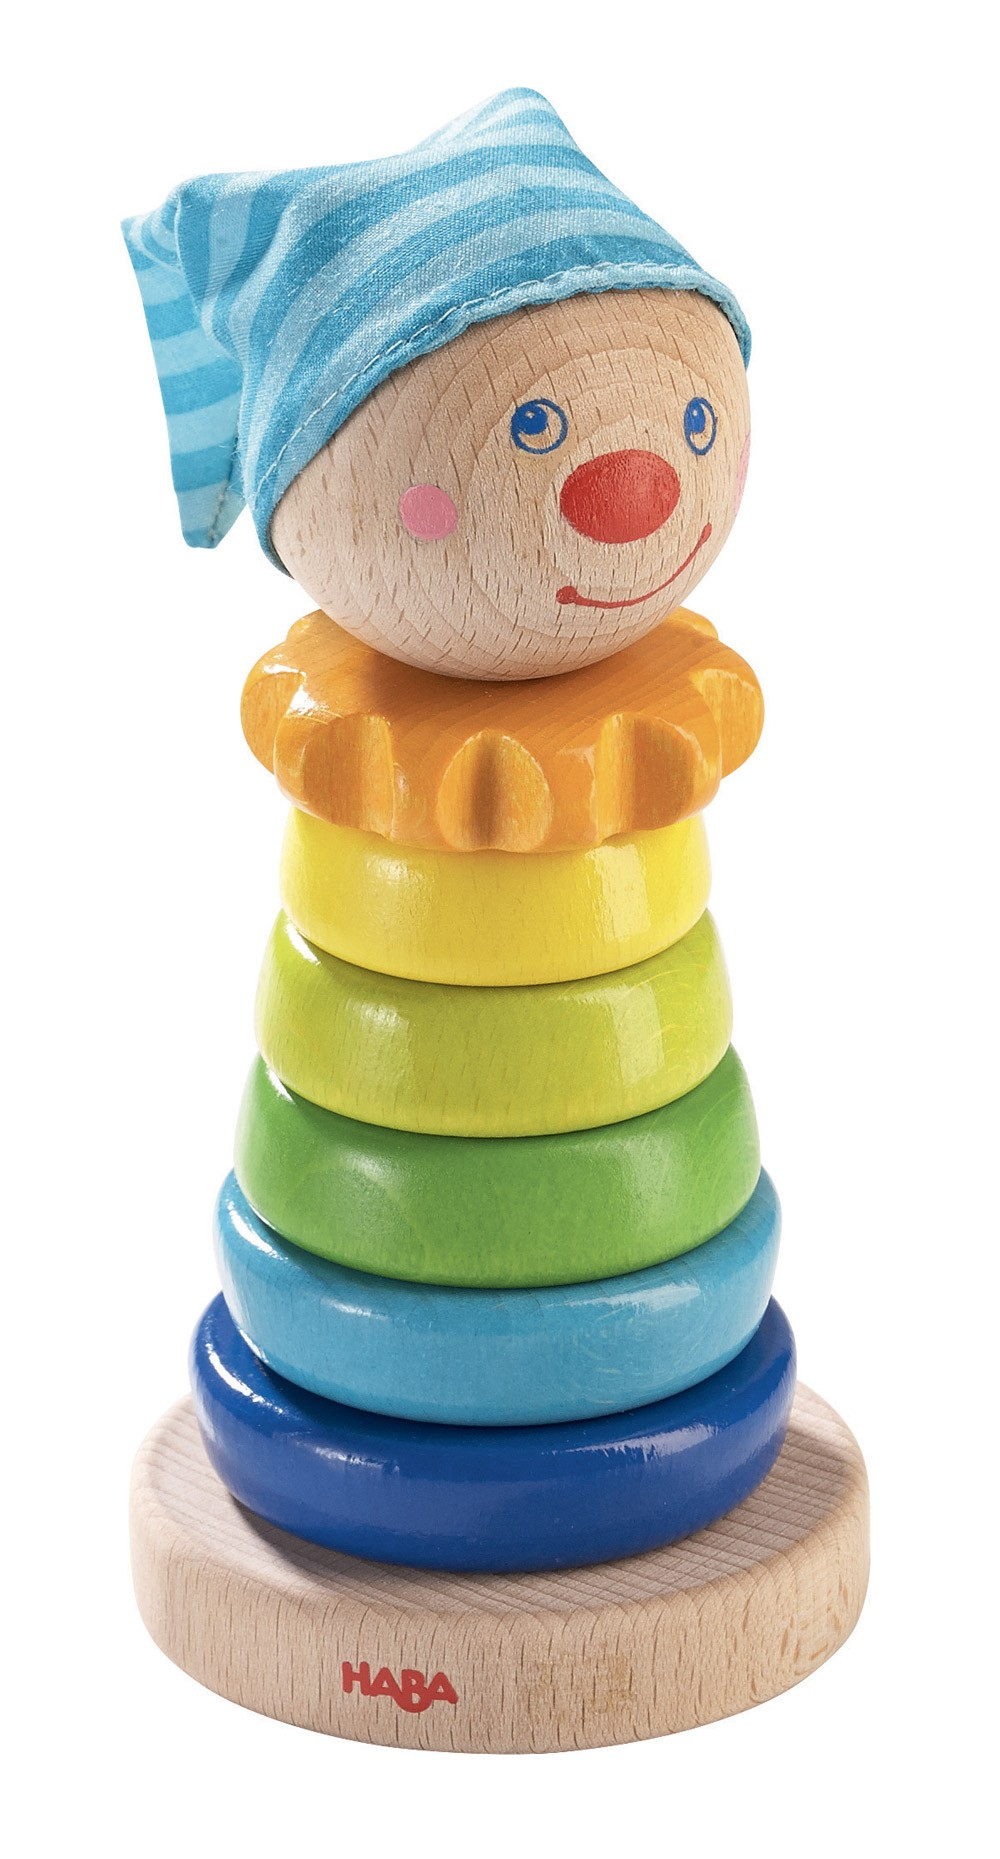 haba jouet empiler bois guignol